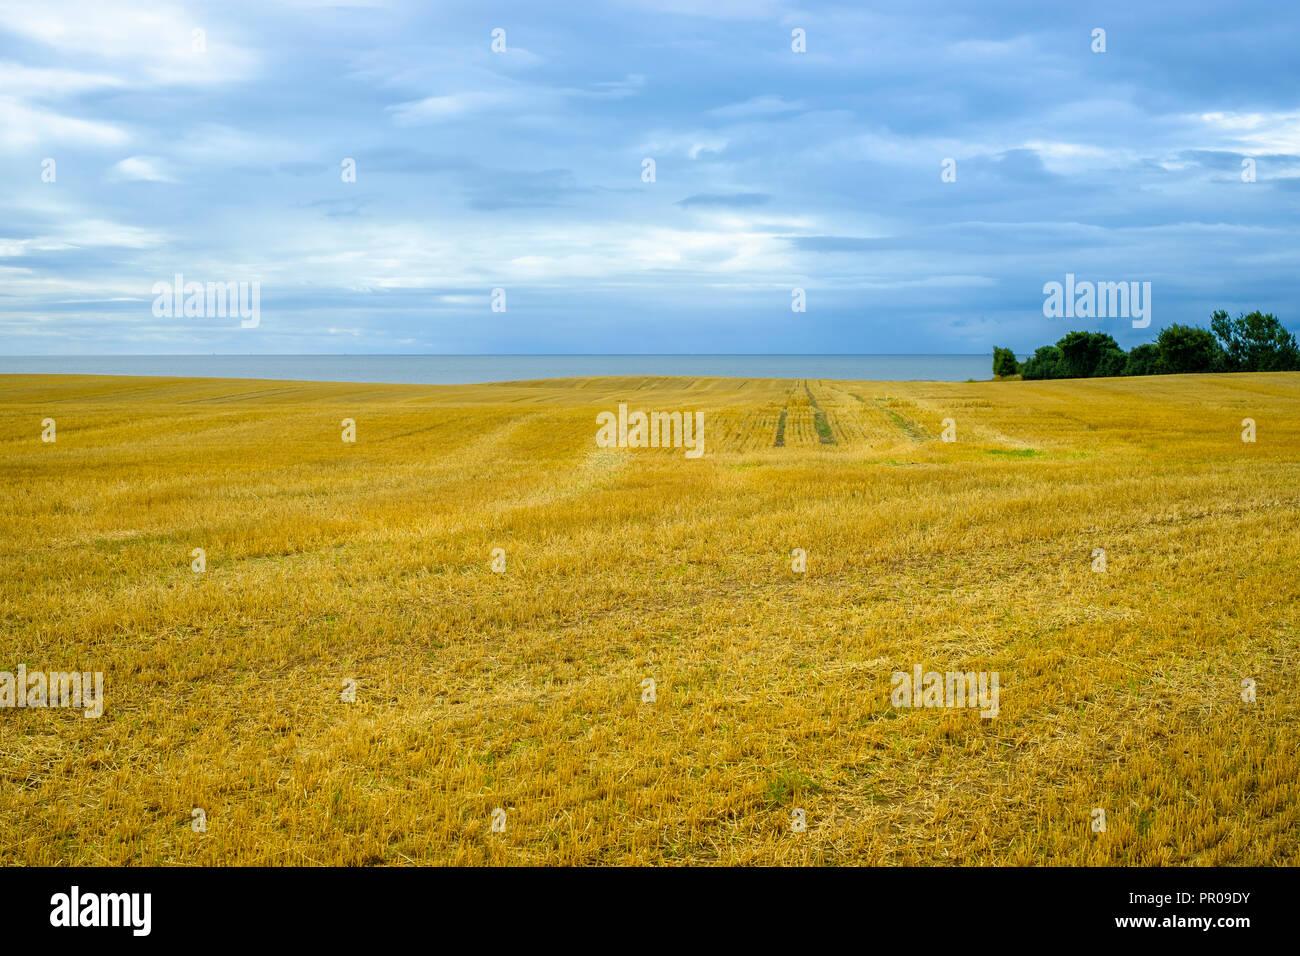 Rural area landscape and Baltic Sea in mystic light, Moen Island, Denmark, Scandinavia, Europe. Stock Photo